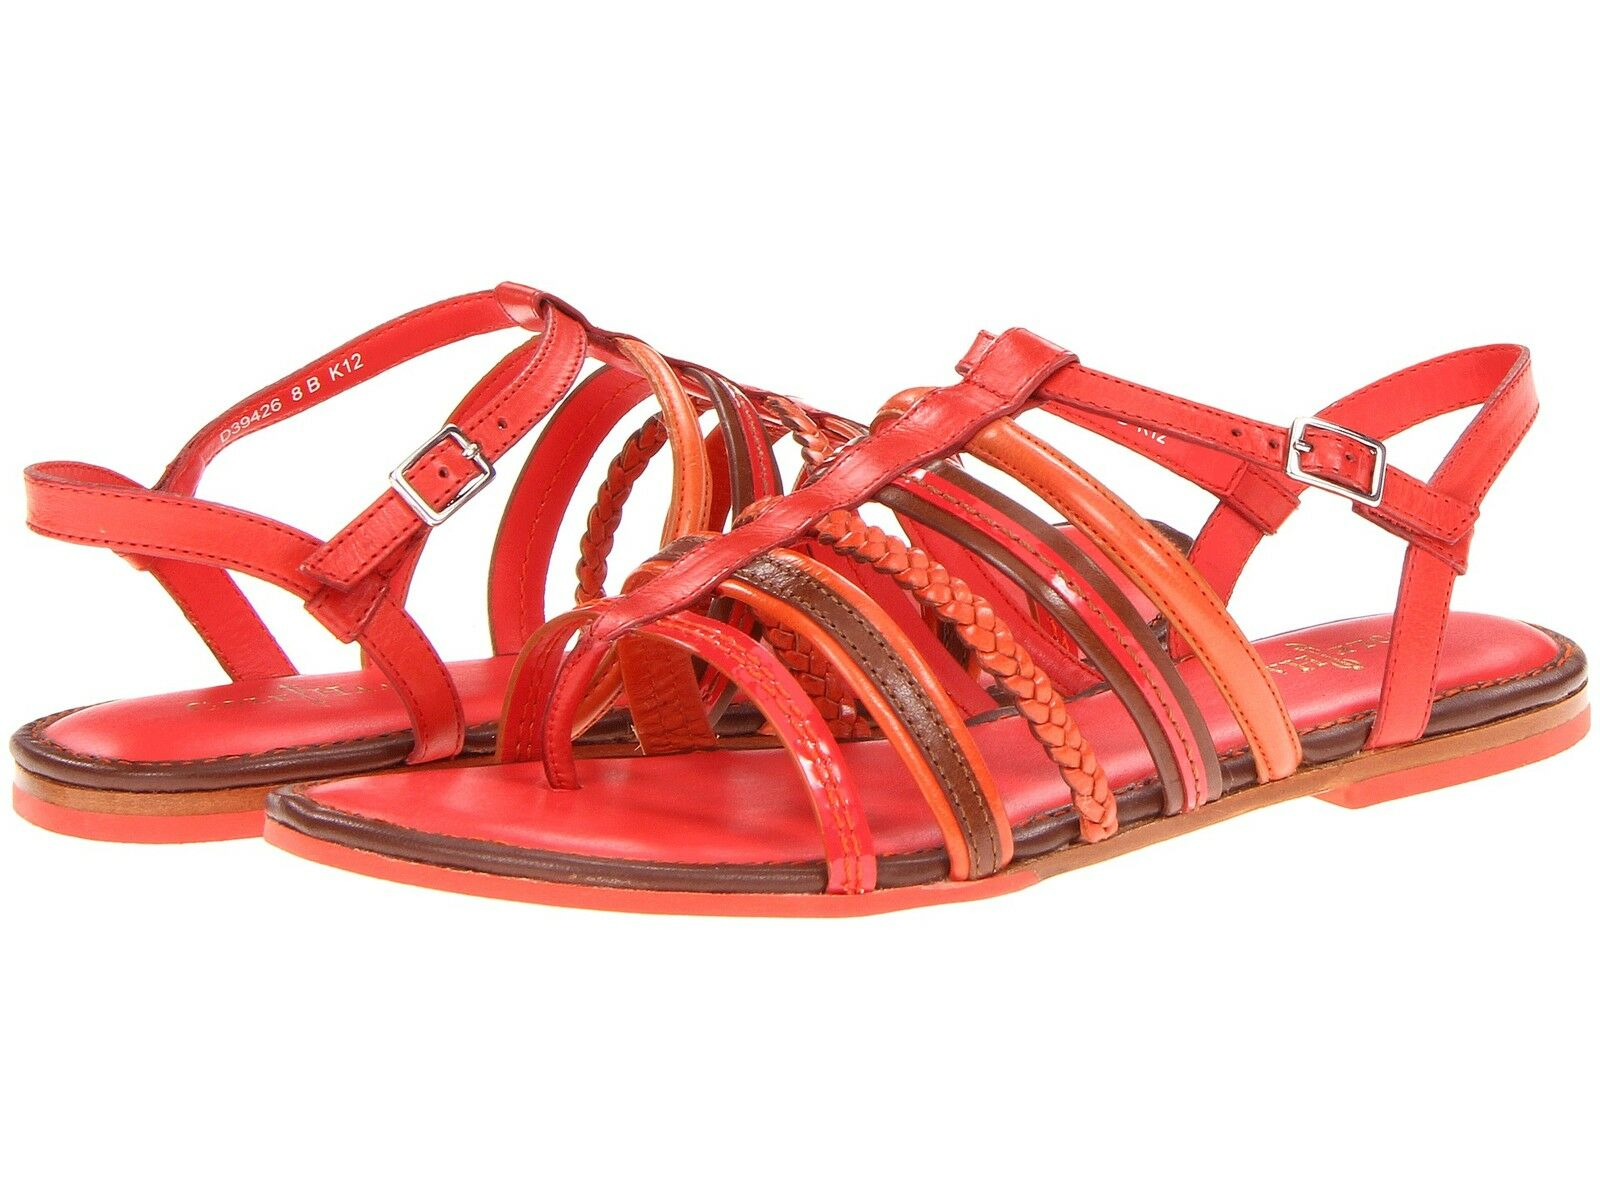 Cole Haan Nassau Flats Slingback Sandals Womens Cherry orange 6.5 NEW IN BOX